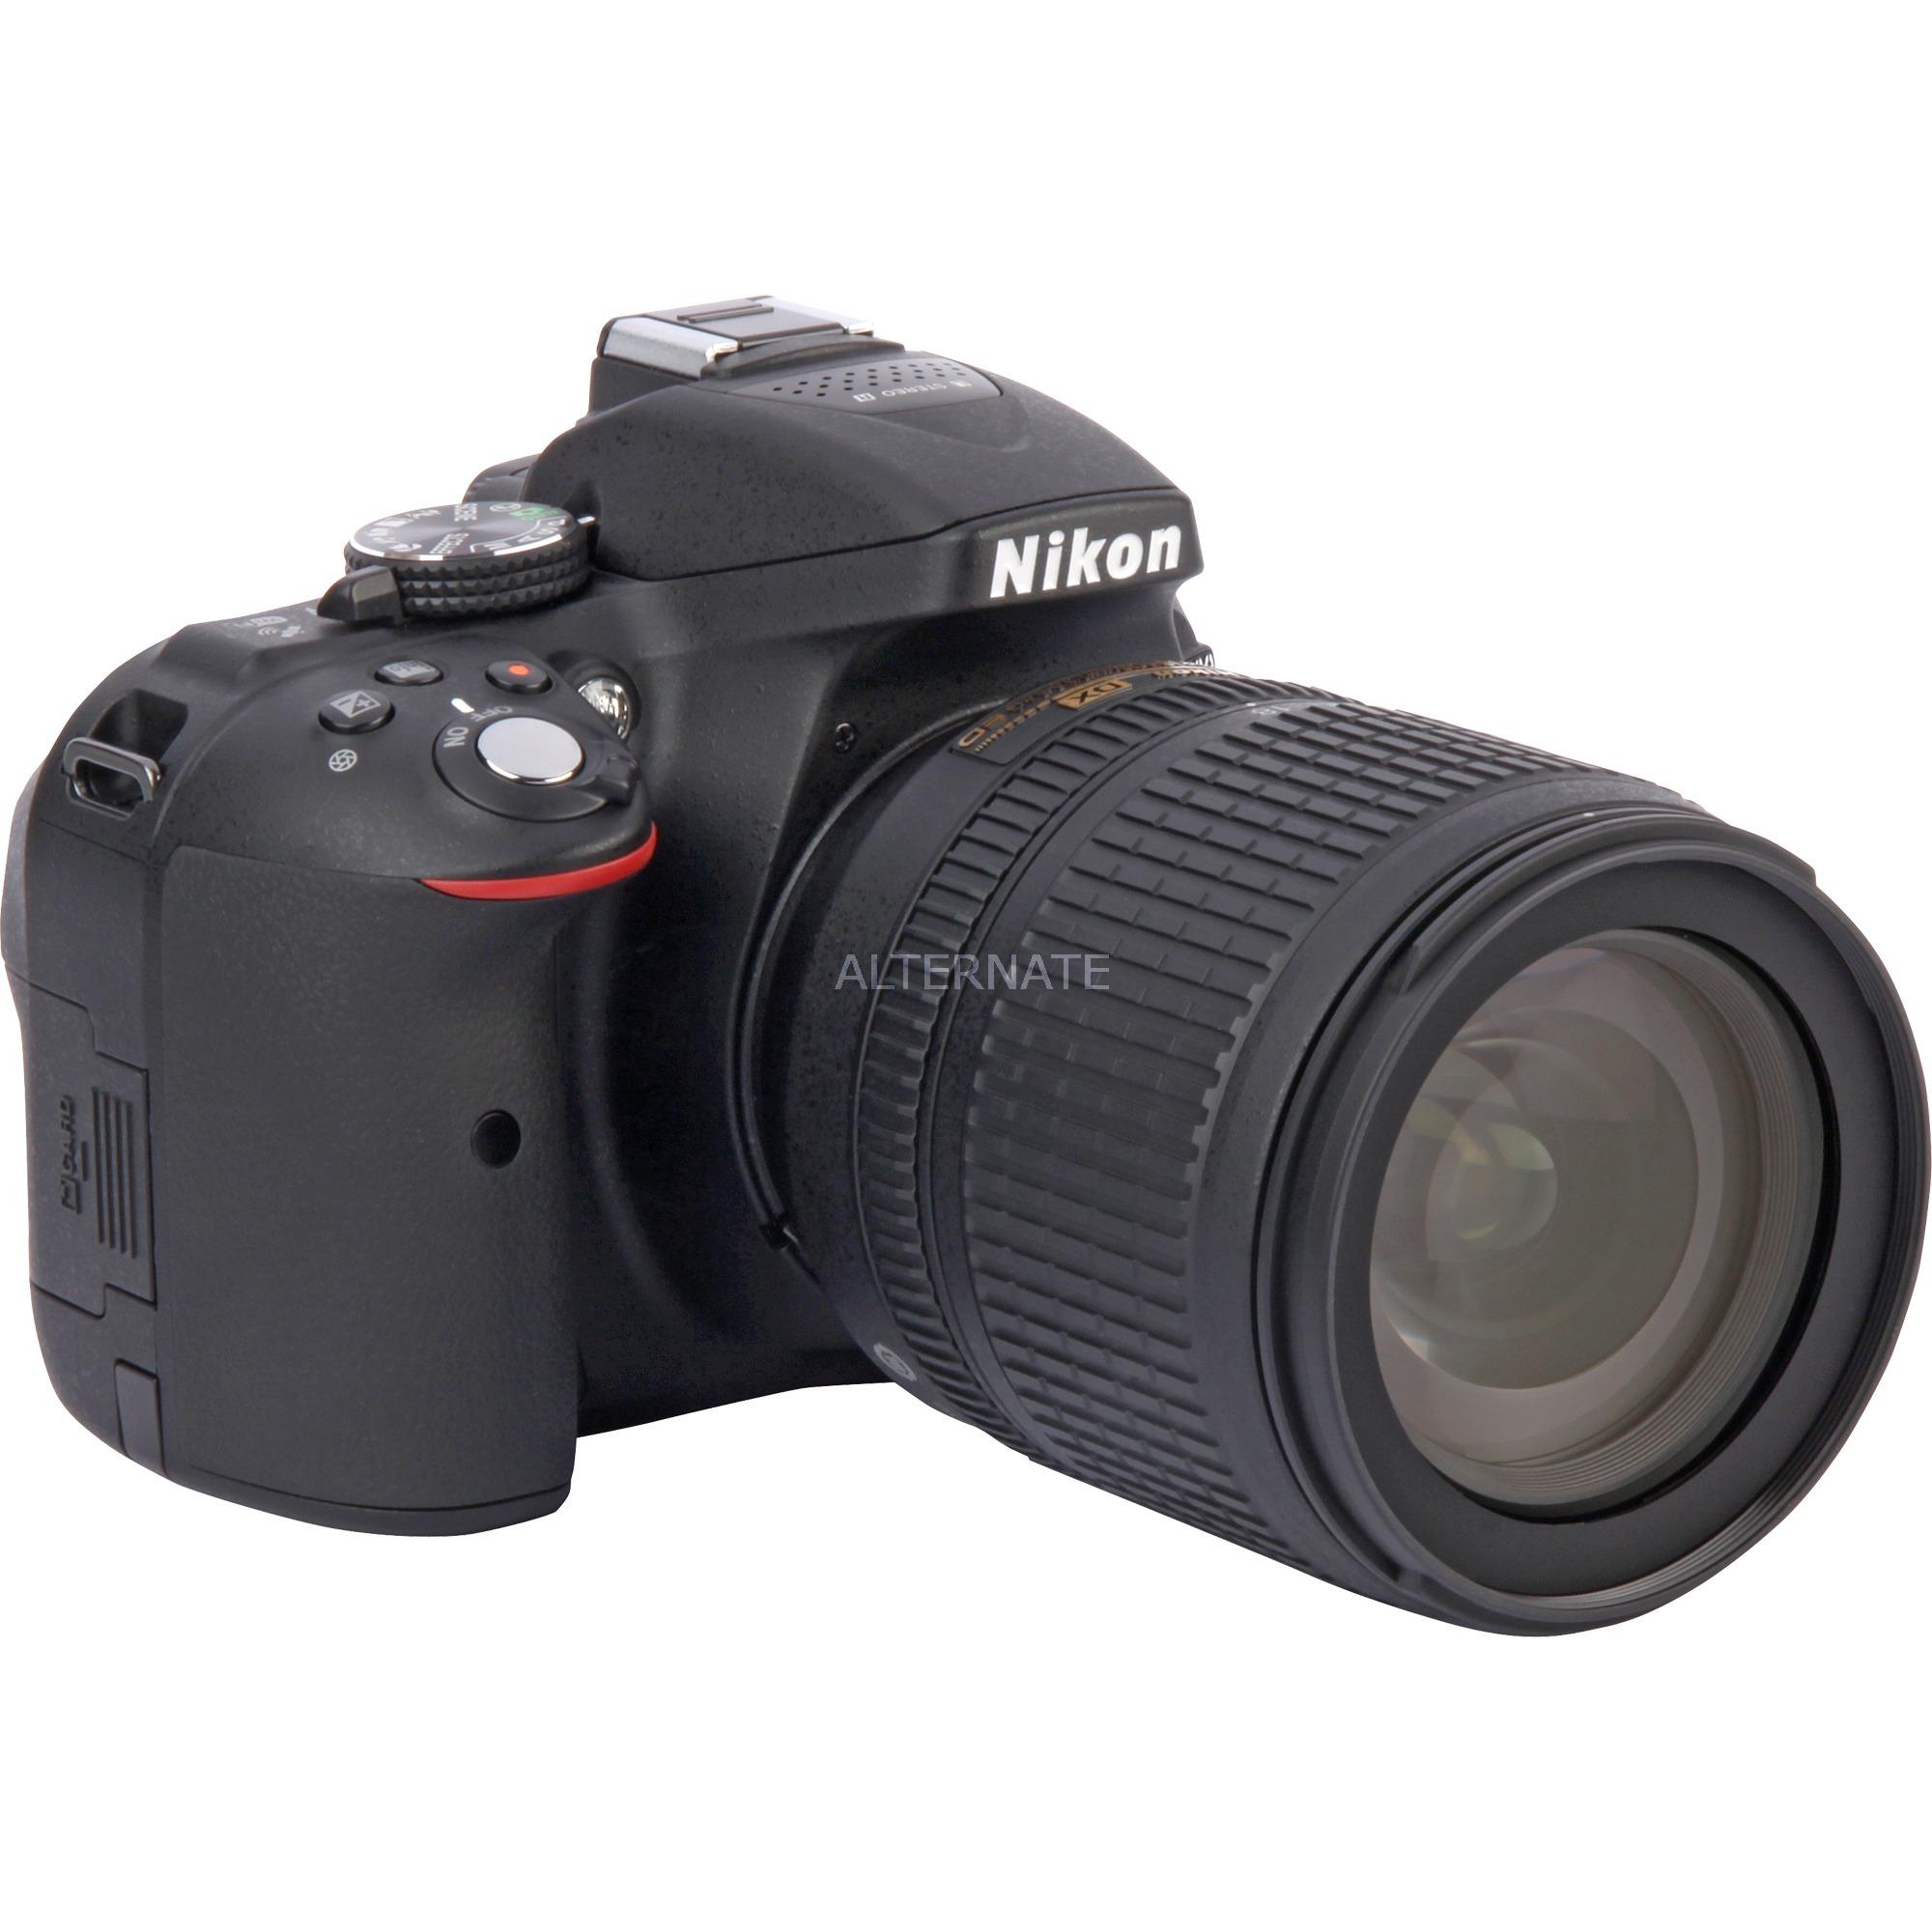 D5300 + AF-S DX NIKKOR 18-105mm Juego de cámara SLR 24.2MP CMOS 6000 x 4000Pixeles Negro, Cámara digital